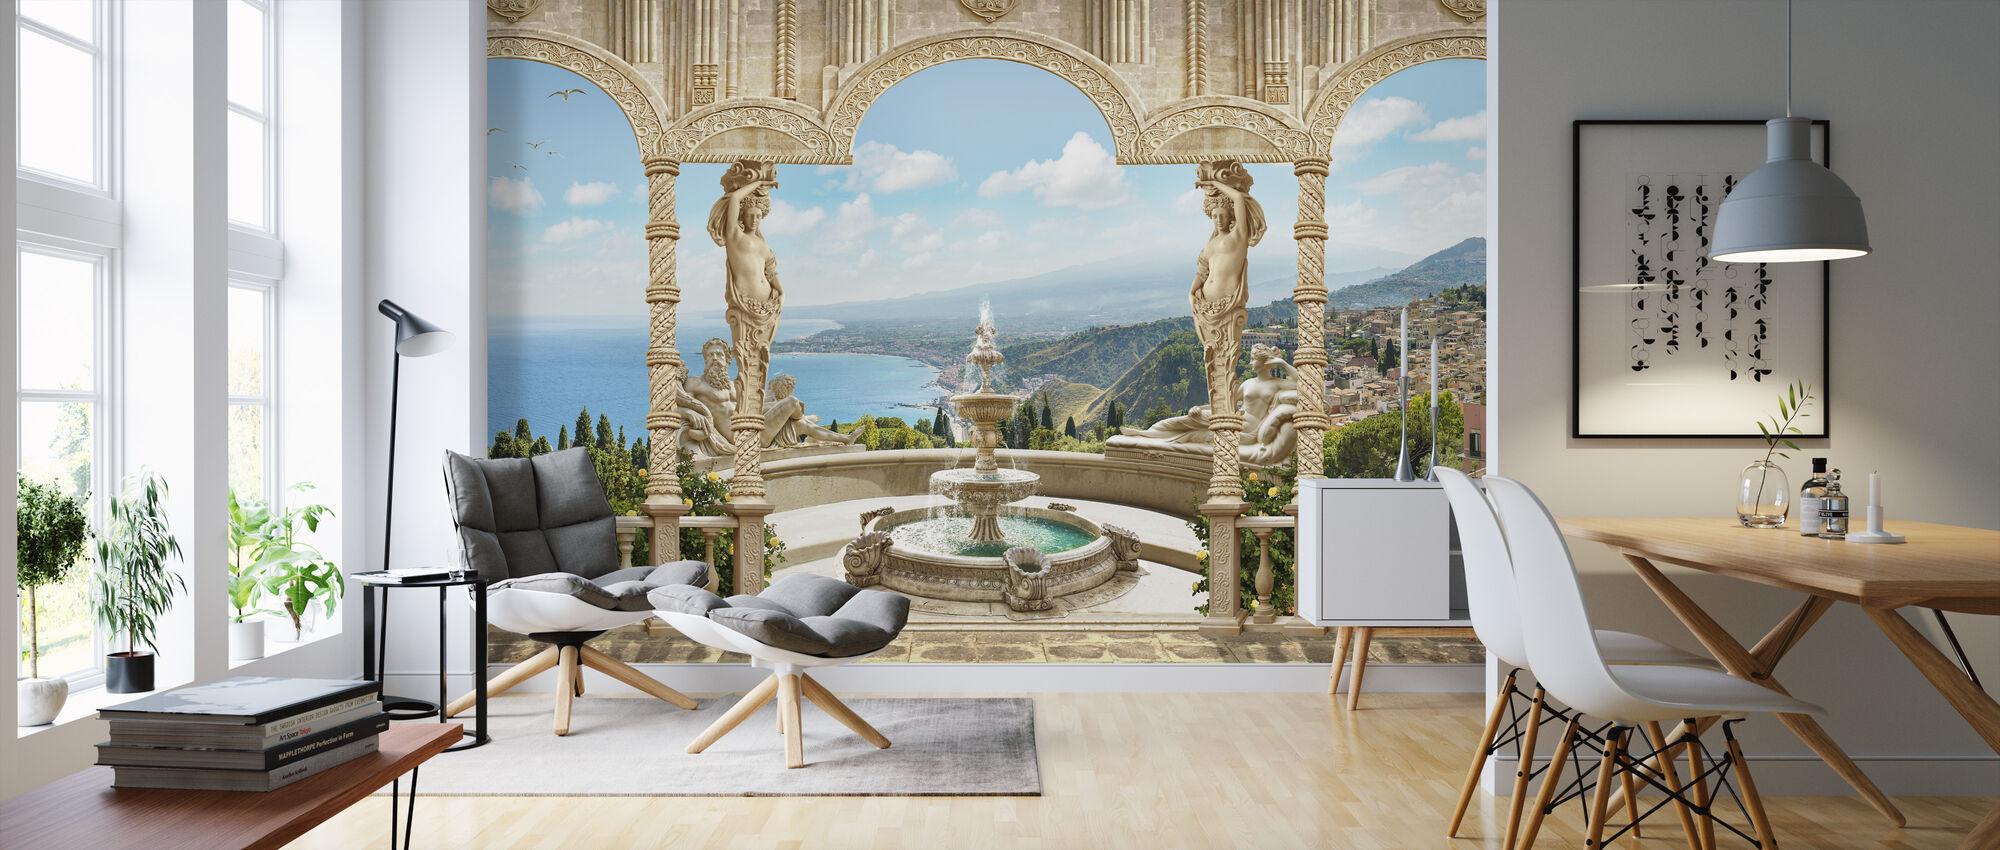 Antique Fountain - Wallpaper - Living Room